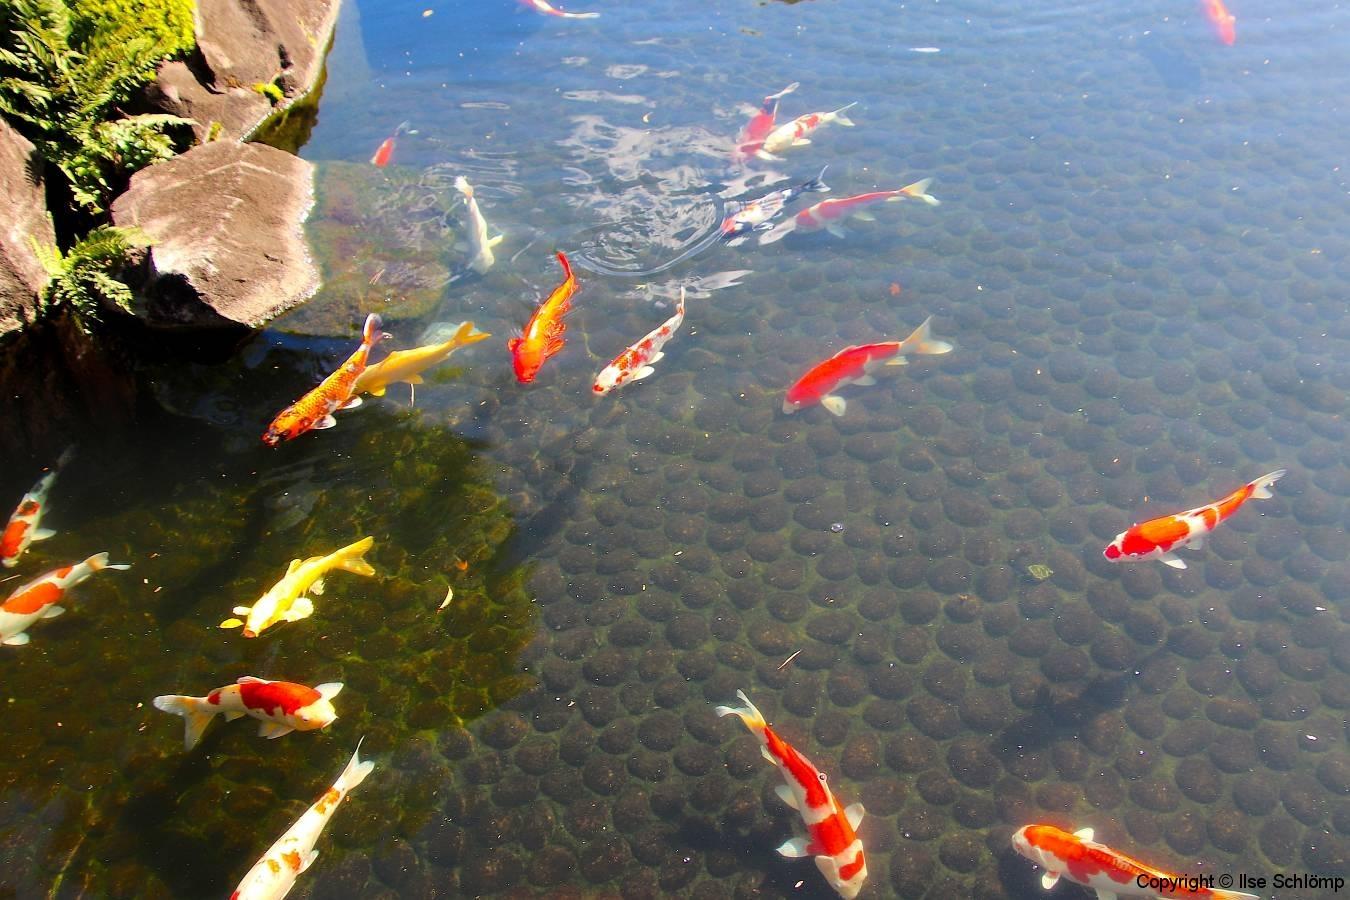 Japan, Himeji, Koko-en-Garten, Koi